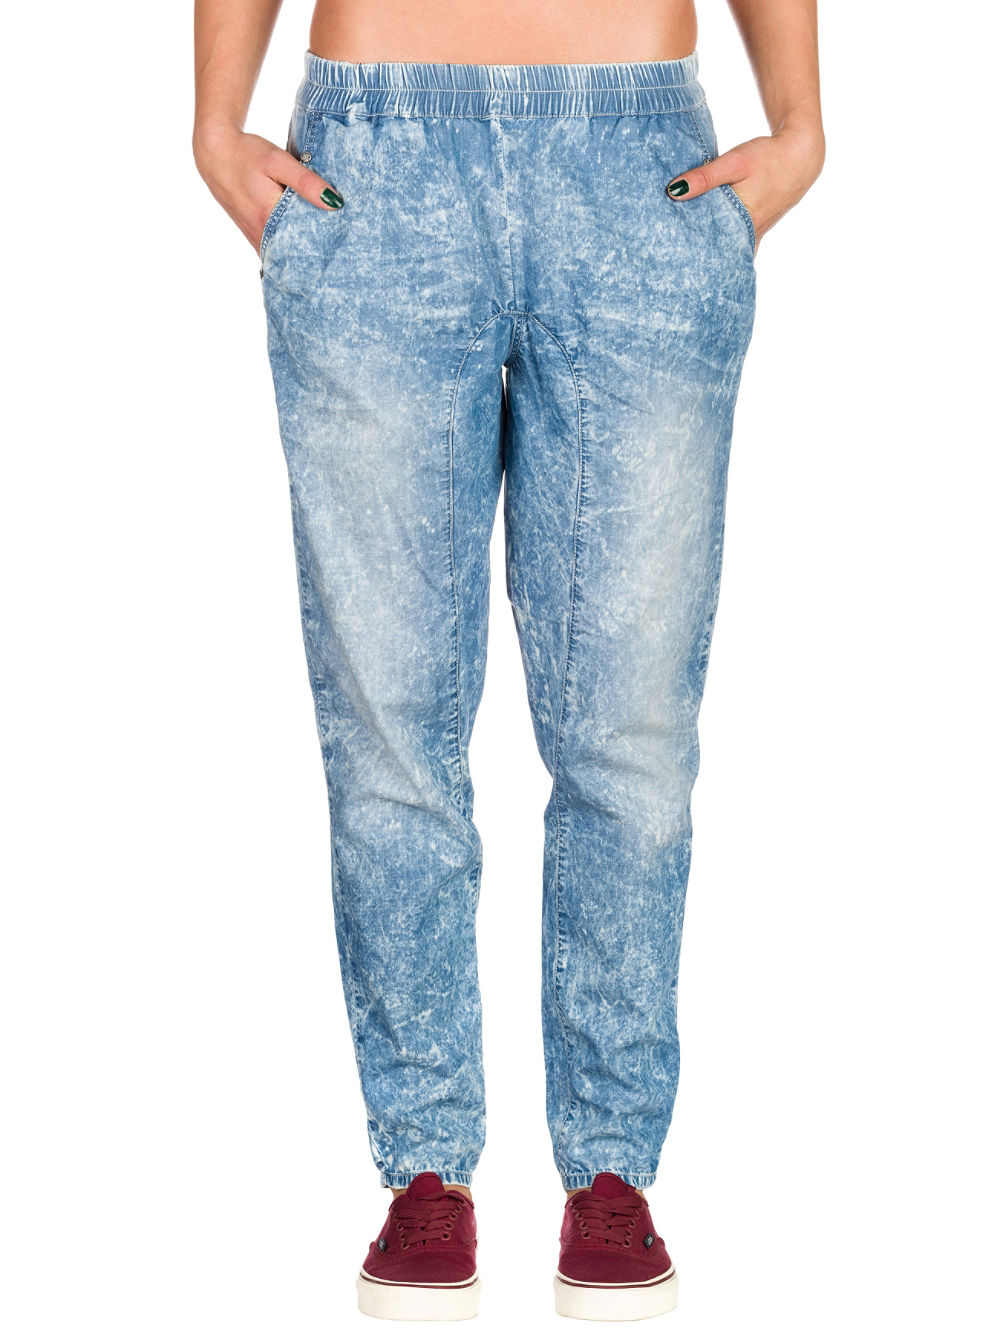 nikita-reality-slim-jeans